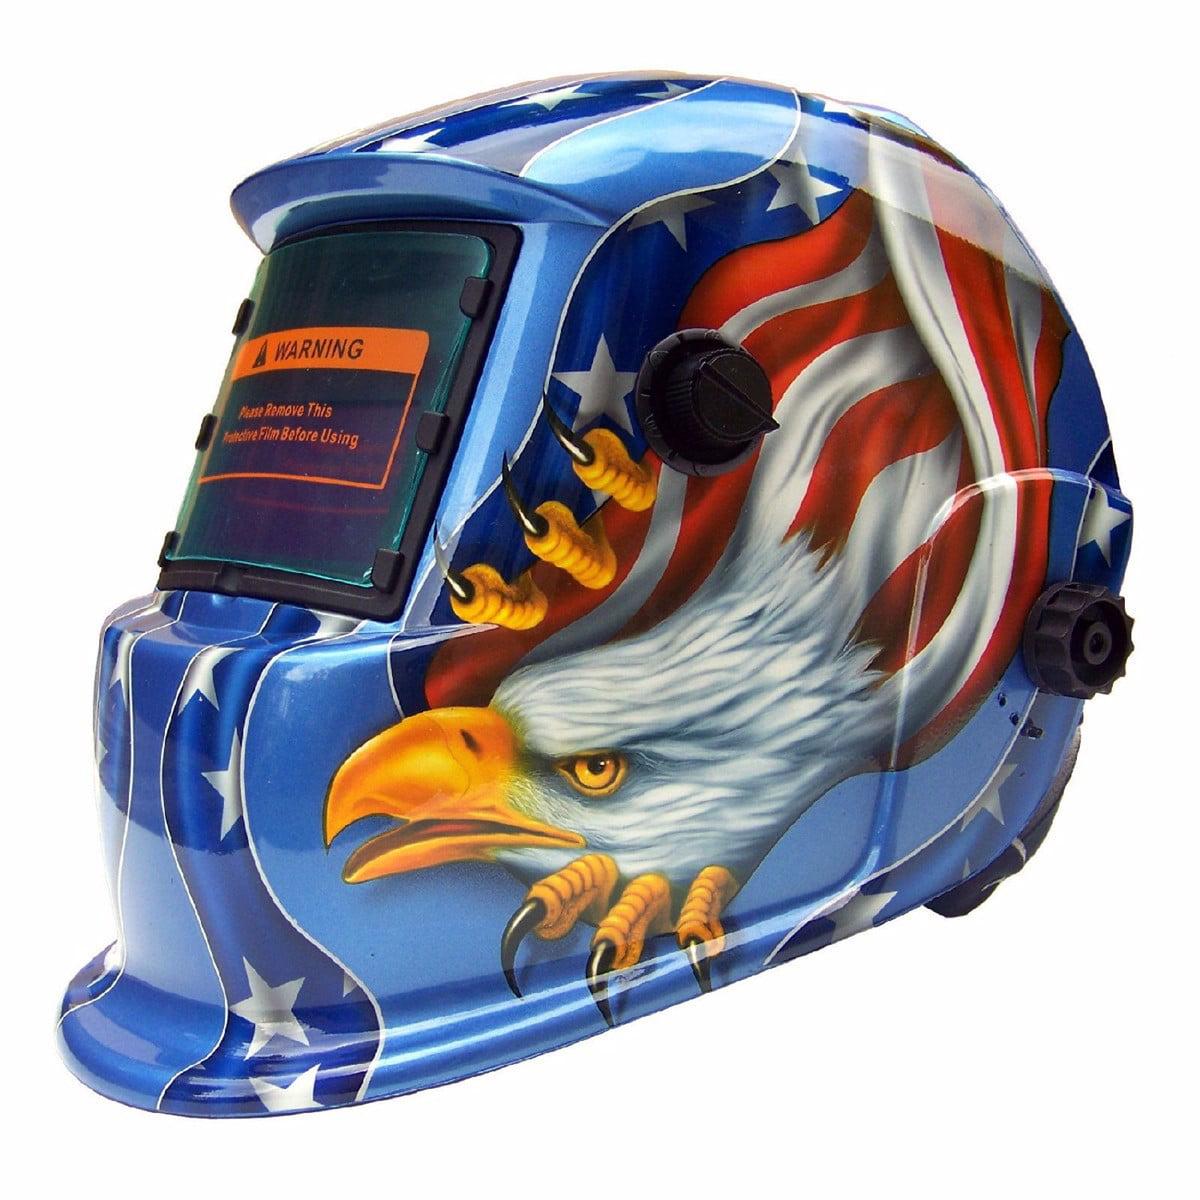 Adjustable Welding Helmet Arc Tig Mig Grinding Welder Mask Head Protect Blue